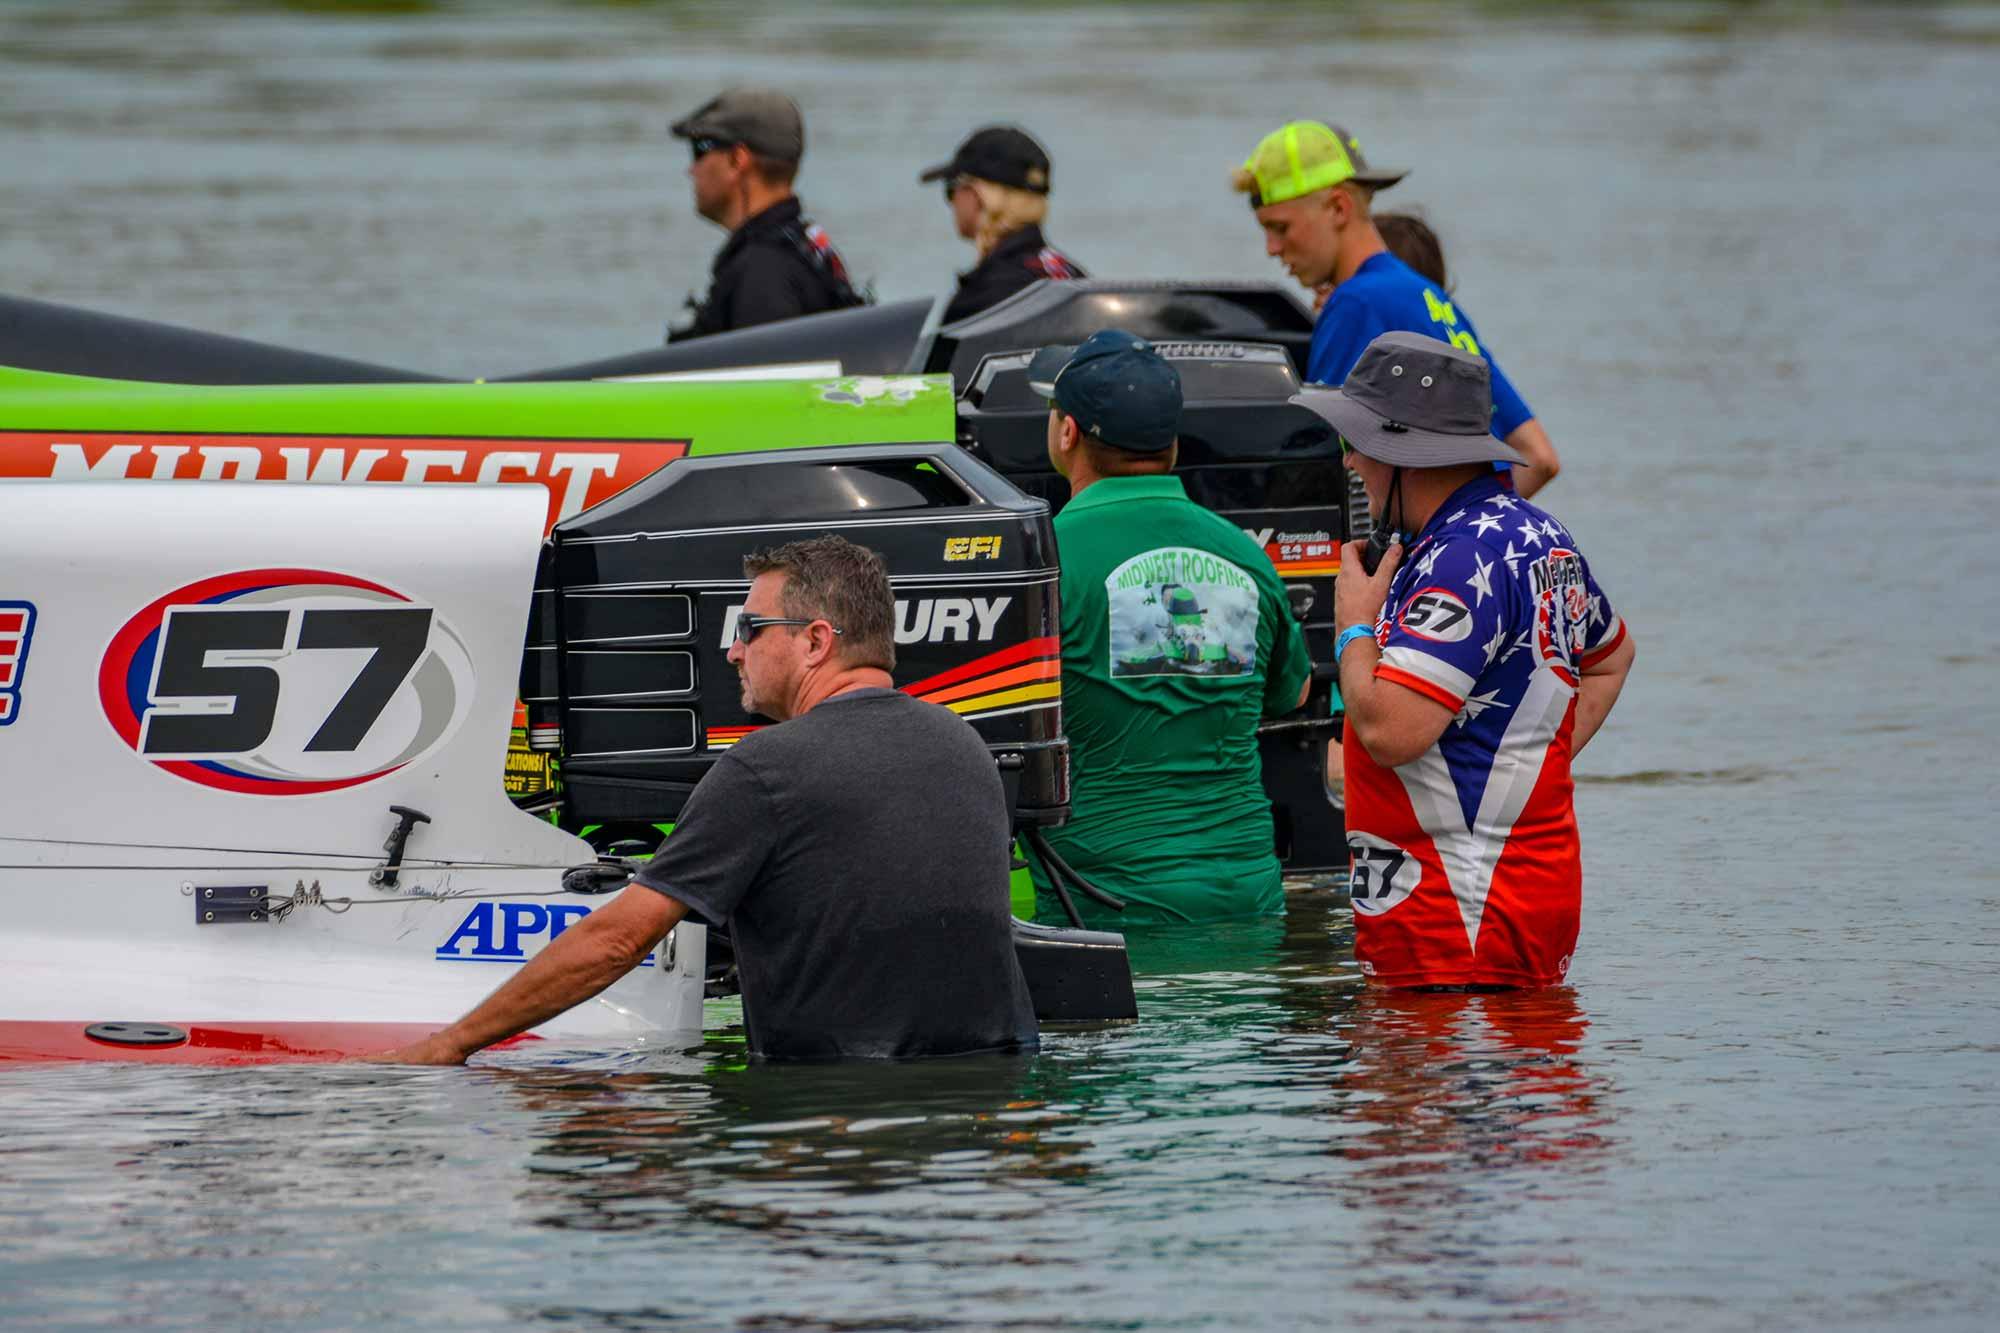 McMurray-Racing-Nashvill-Marine-2021-Springfield-F1-Race-25